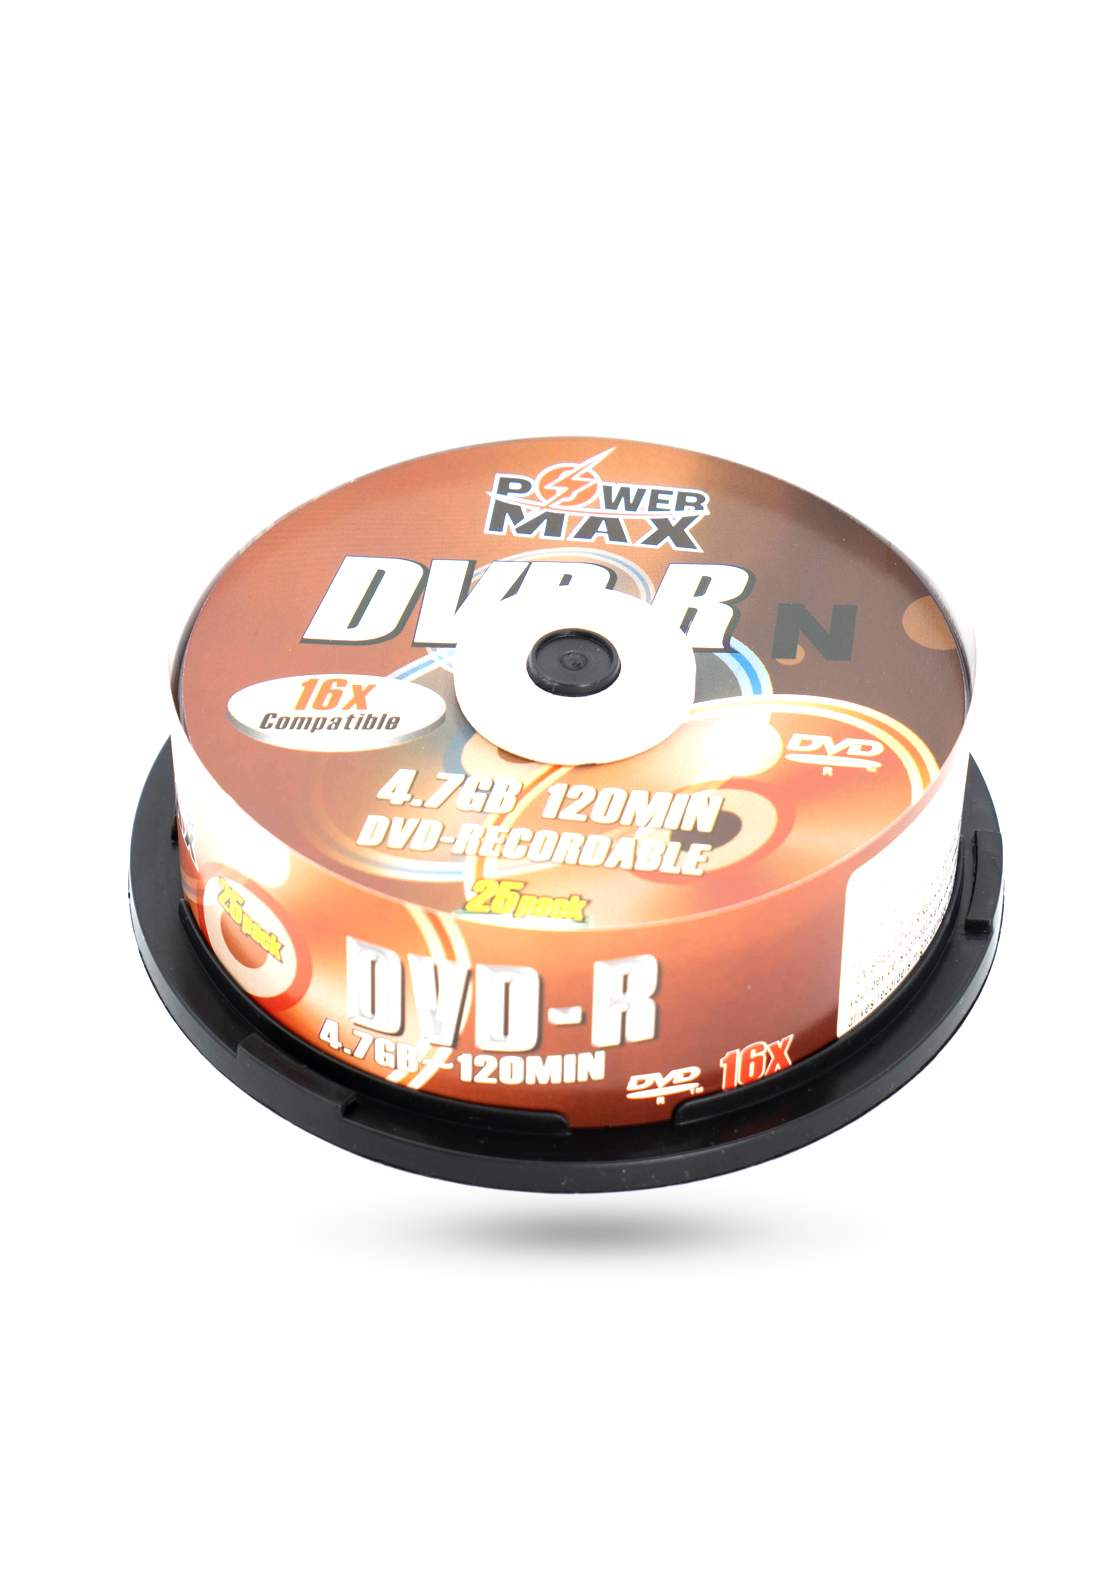 Power Max DVD-R 4.7MB/120 Minutes 16x Recordable Disc  - 25 Pack اقراص دي في دي ليزرية